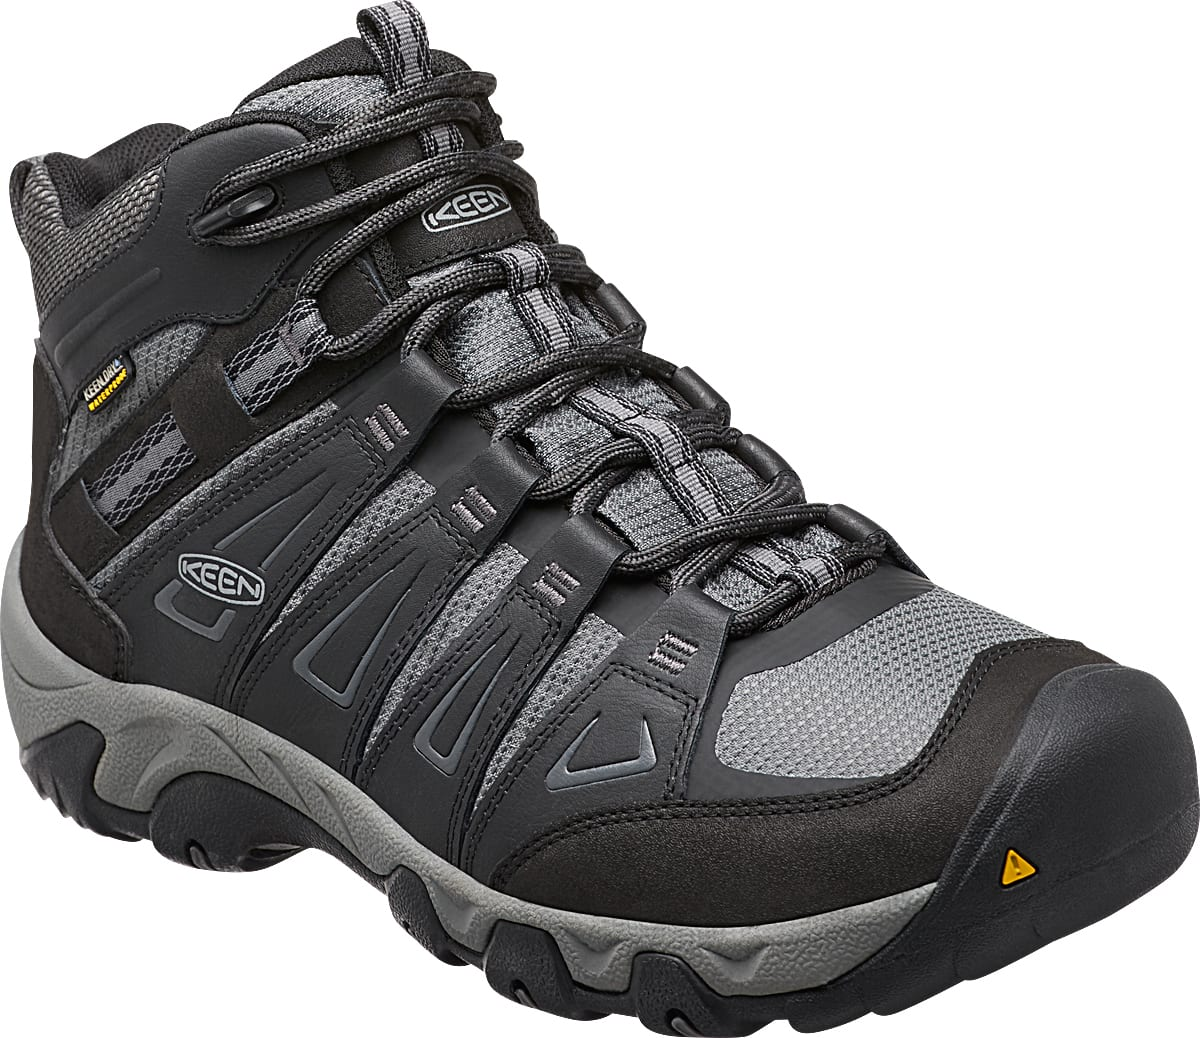 Keen Oakridge Mid Wp Hiking Boots 2019